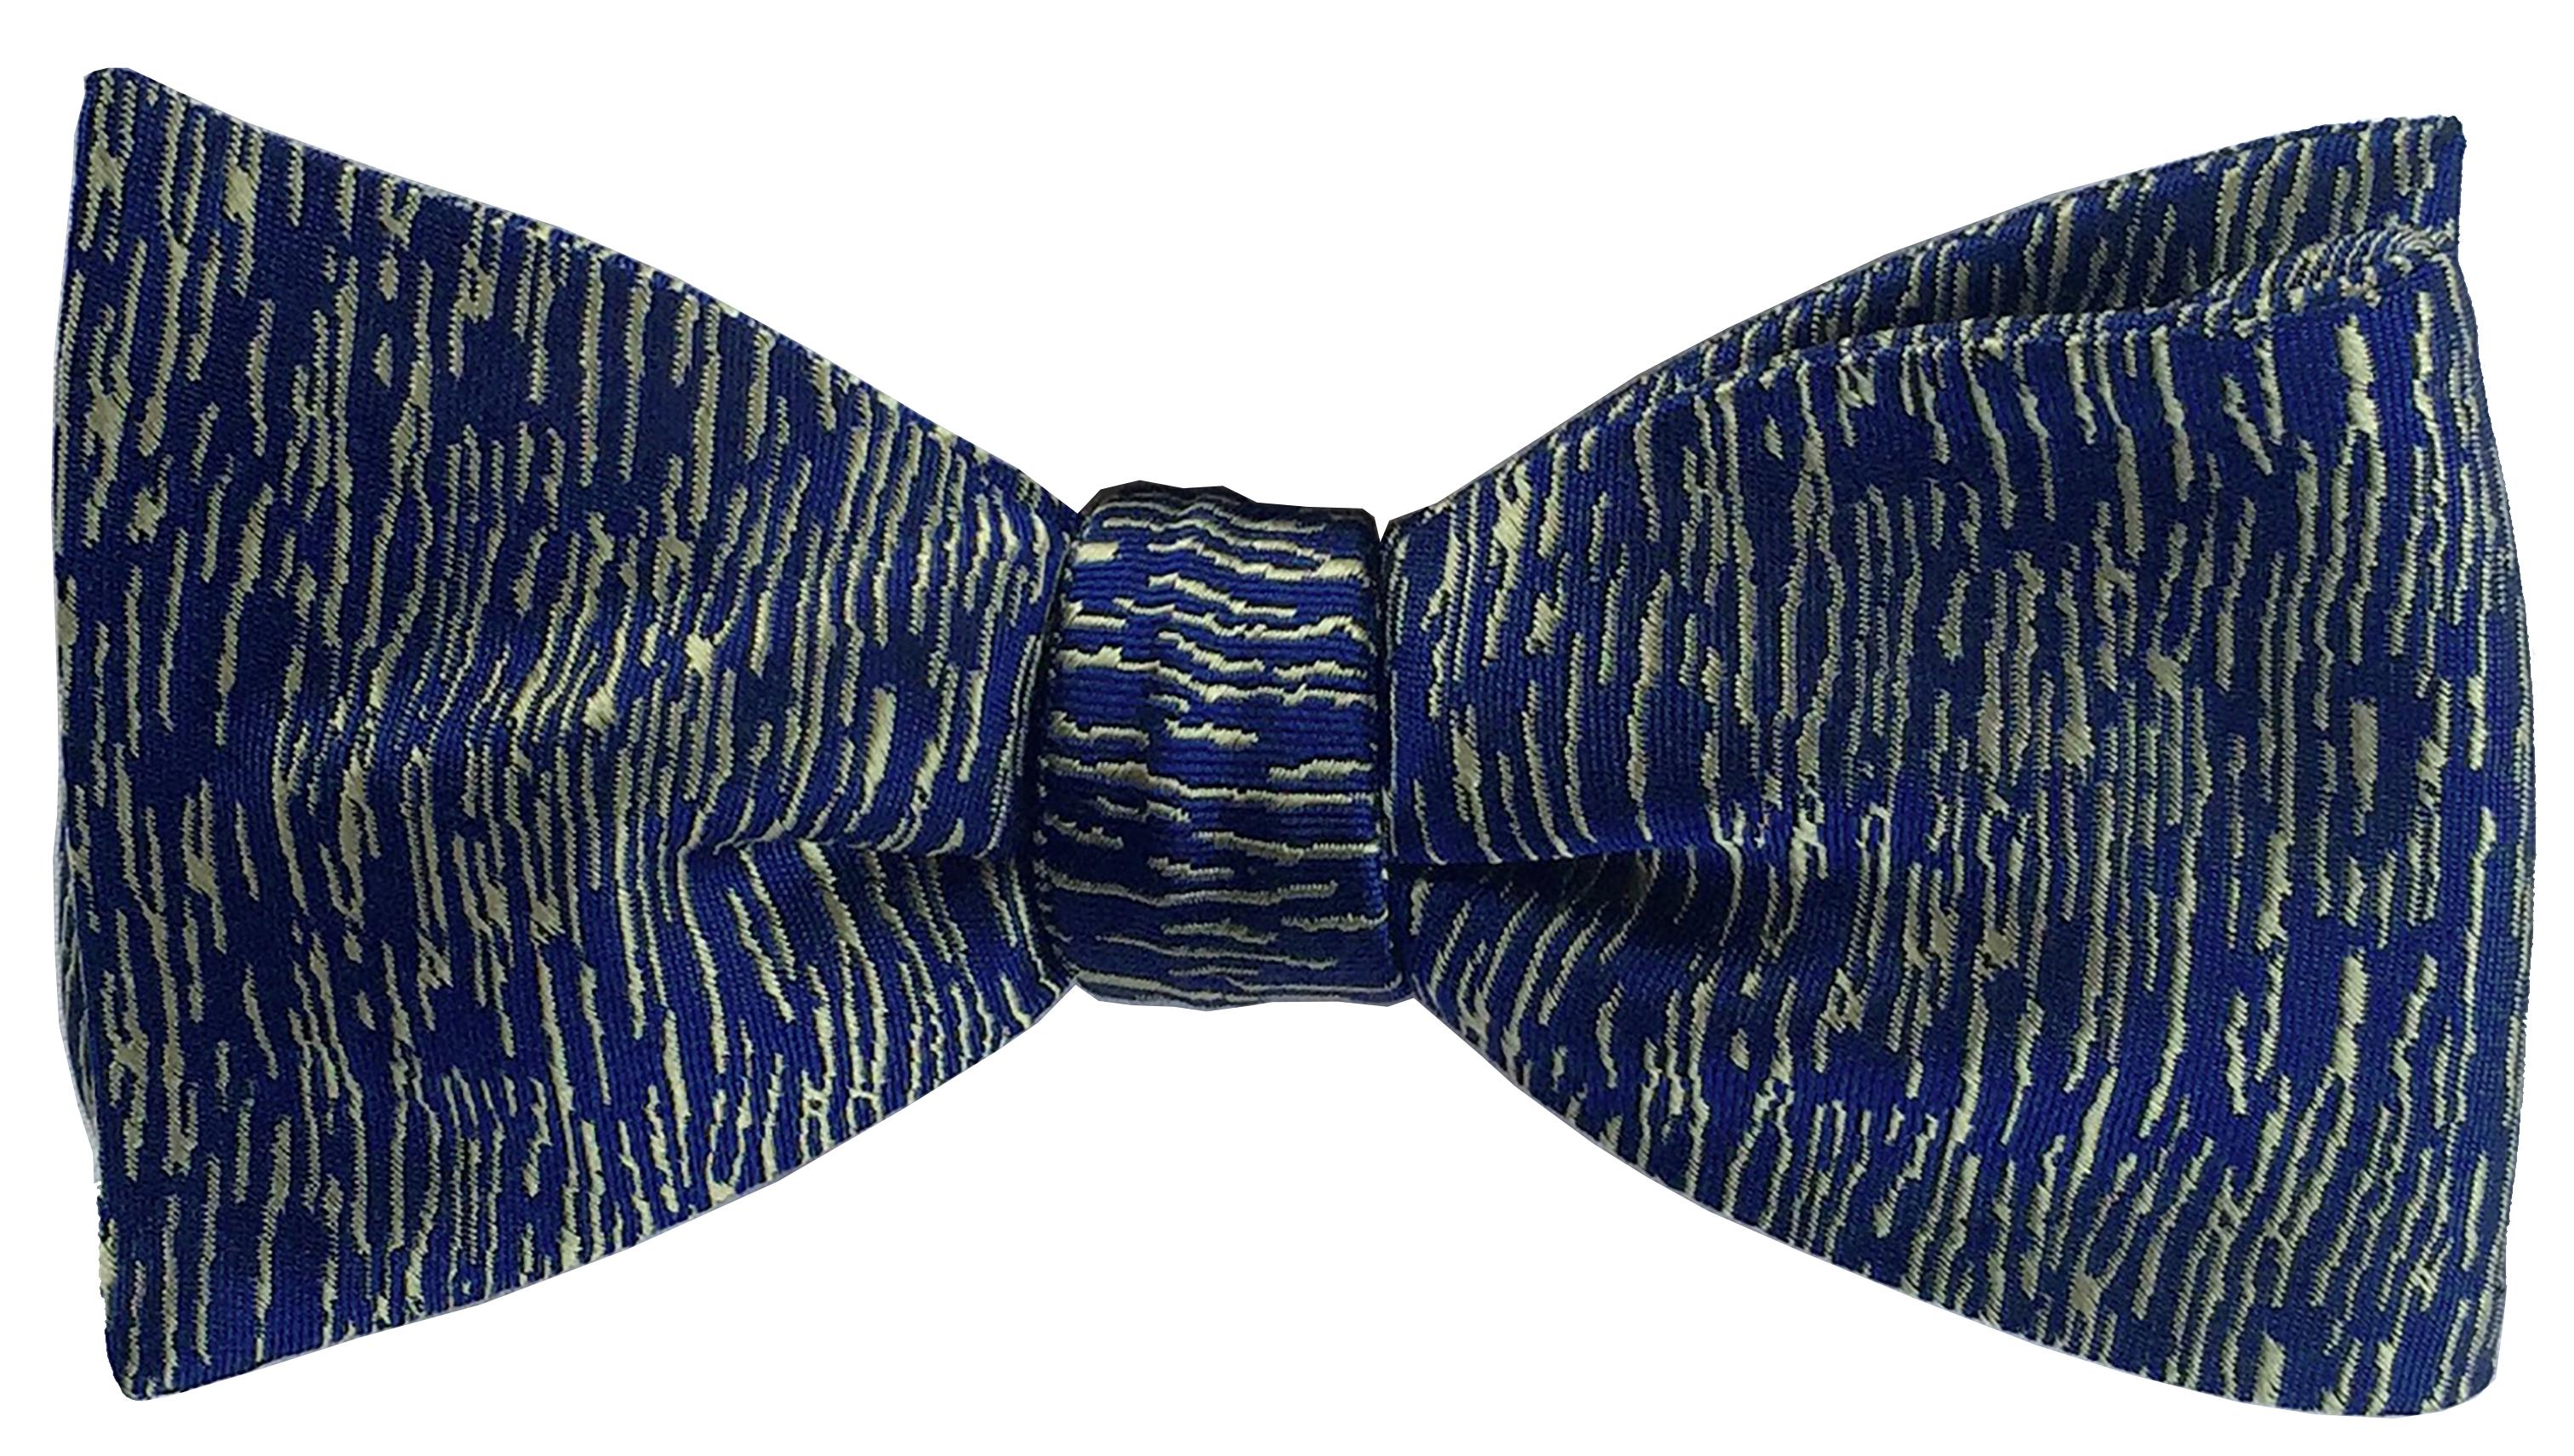 Atlantic Midnight bow tie in royal blue